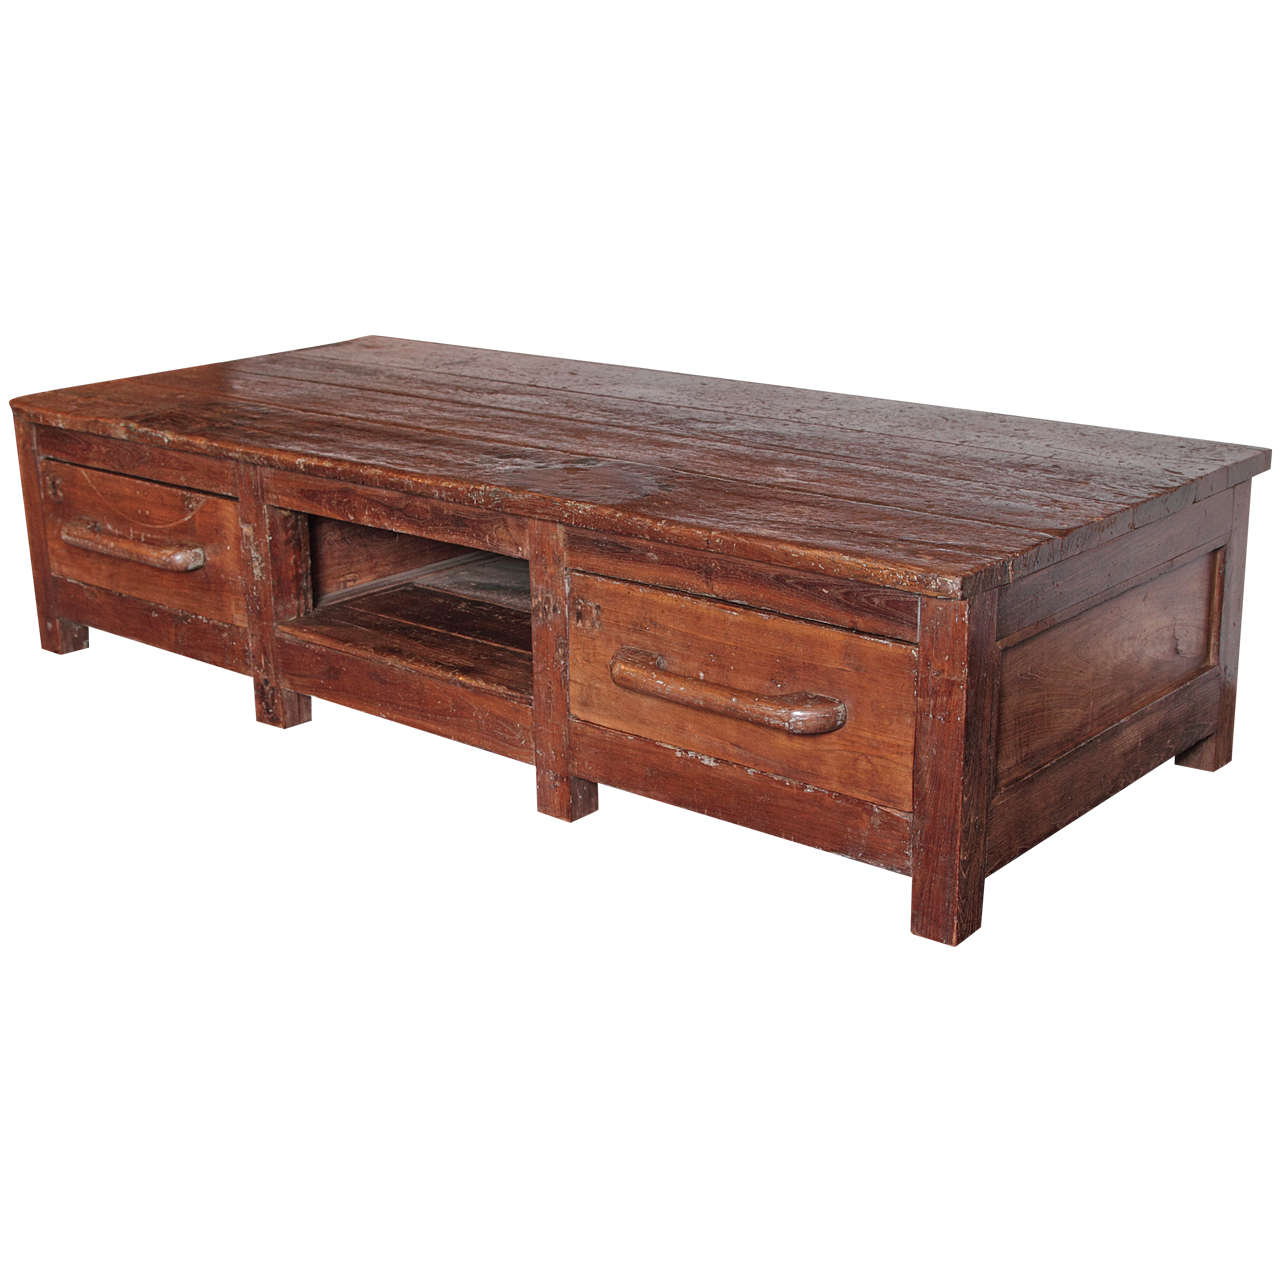 Primitive wabi sabi coffee table at 1stdibs primitive wabi sabi coffee table 1 geotapseo Image collections